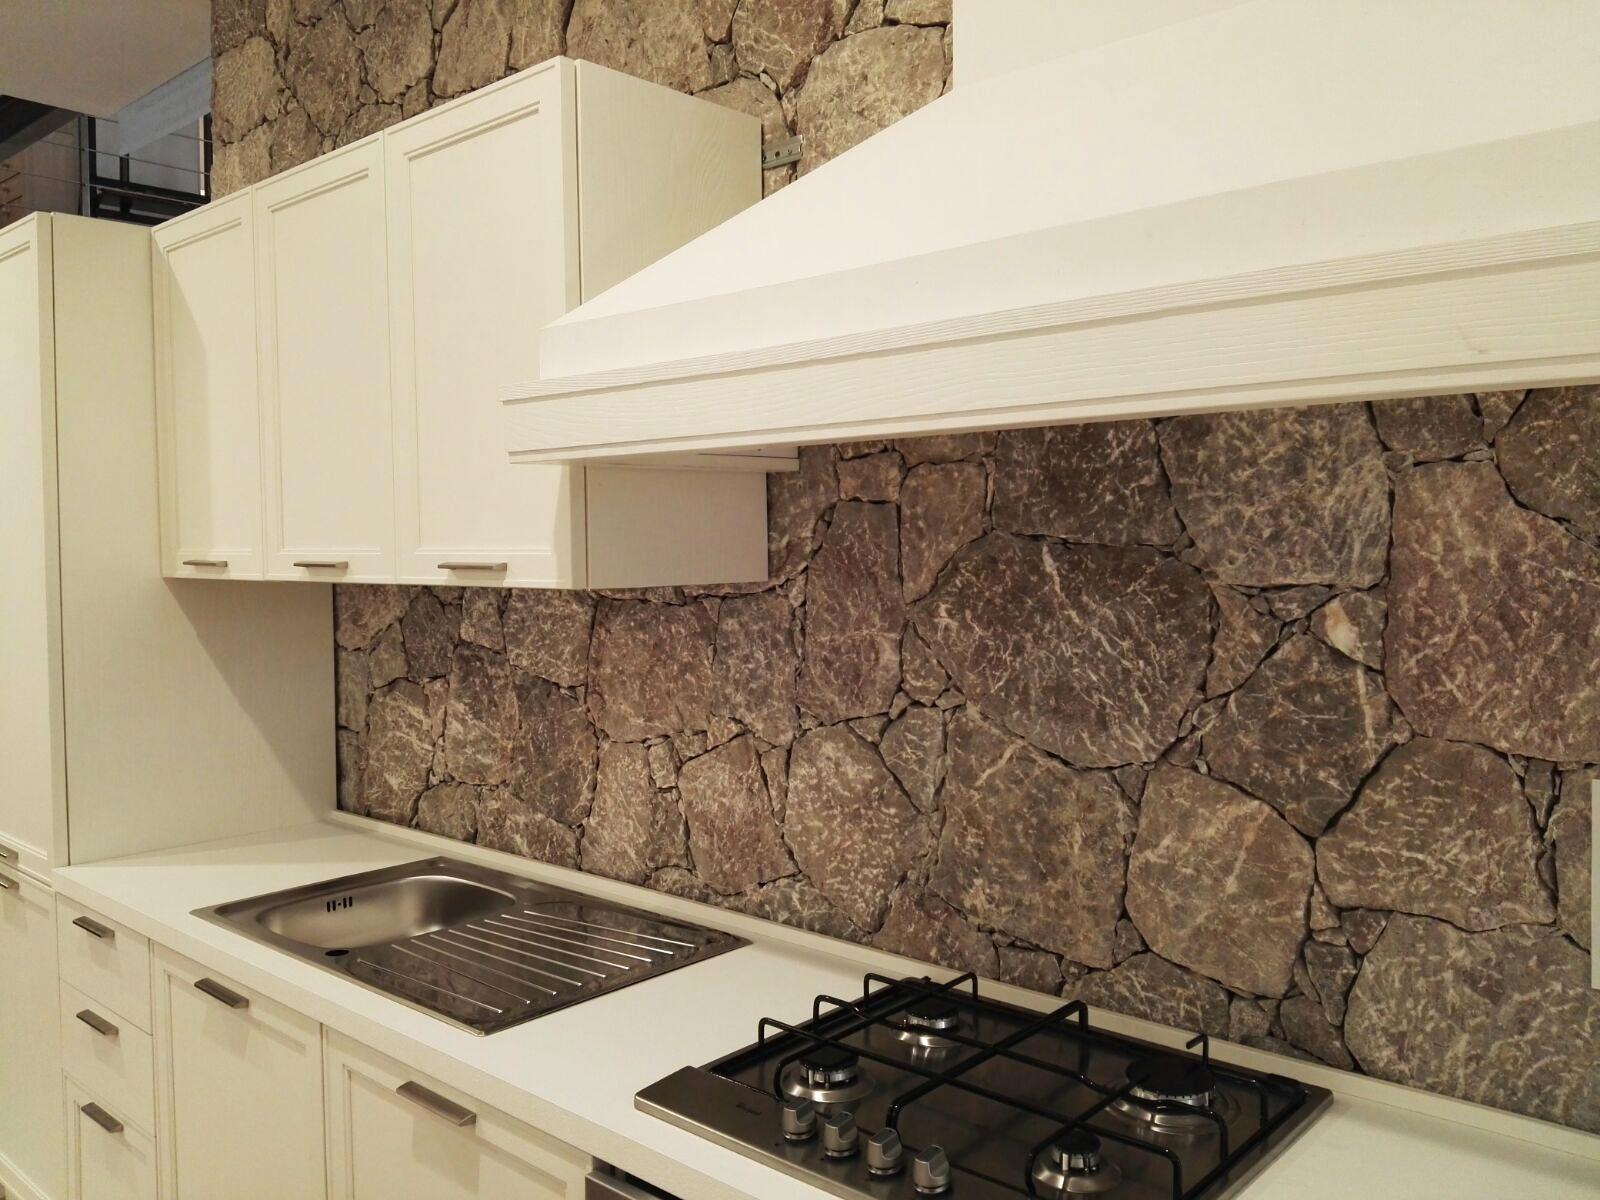 Cucina le fablier melograno moderna legno cucine a - Cucine le fablier ...